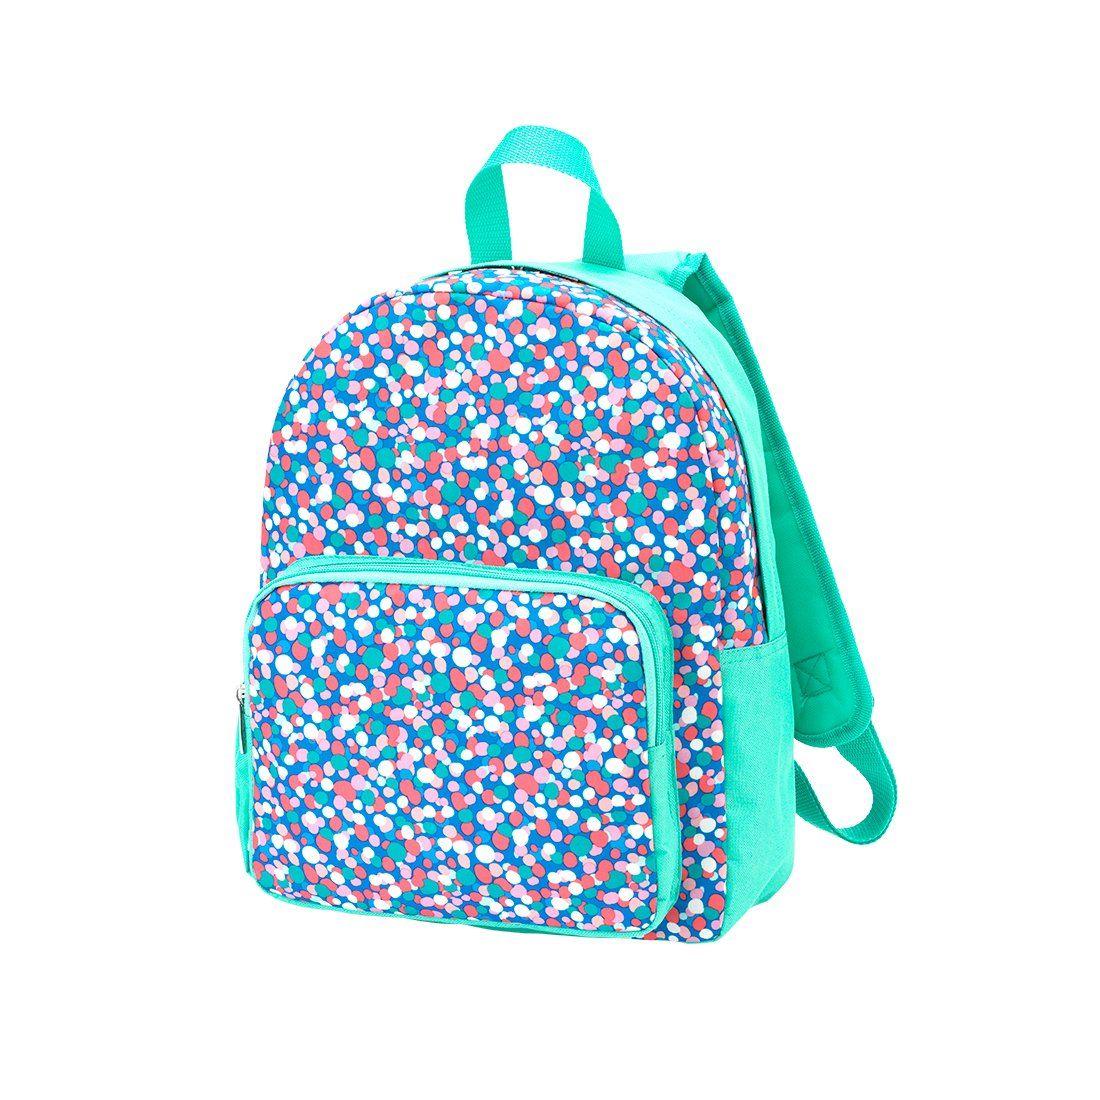 5aa046d99861 Personalized Preschool Backpacks- Fenix Toulouse Handball